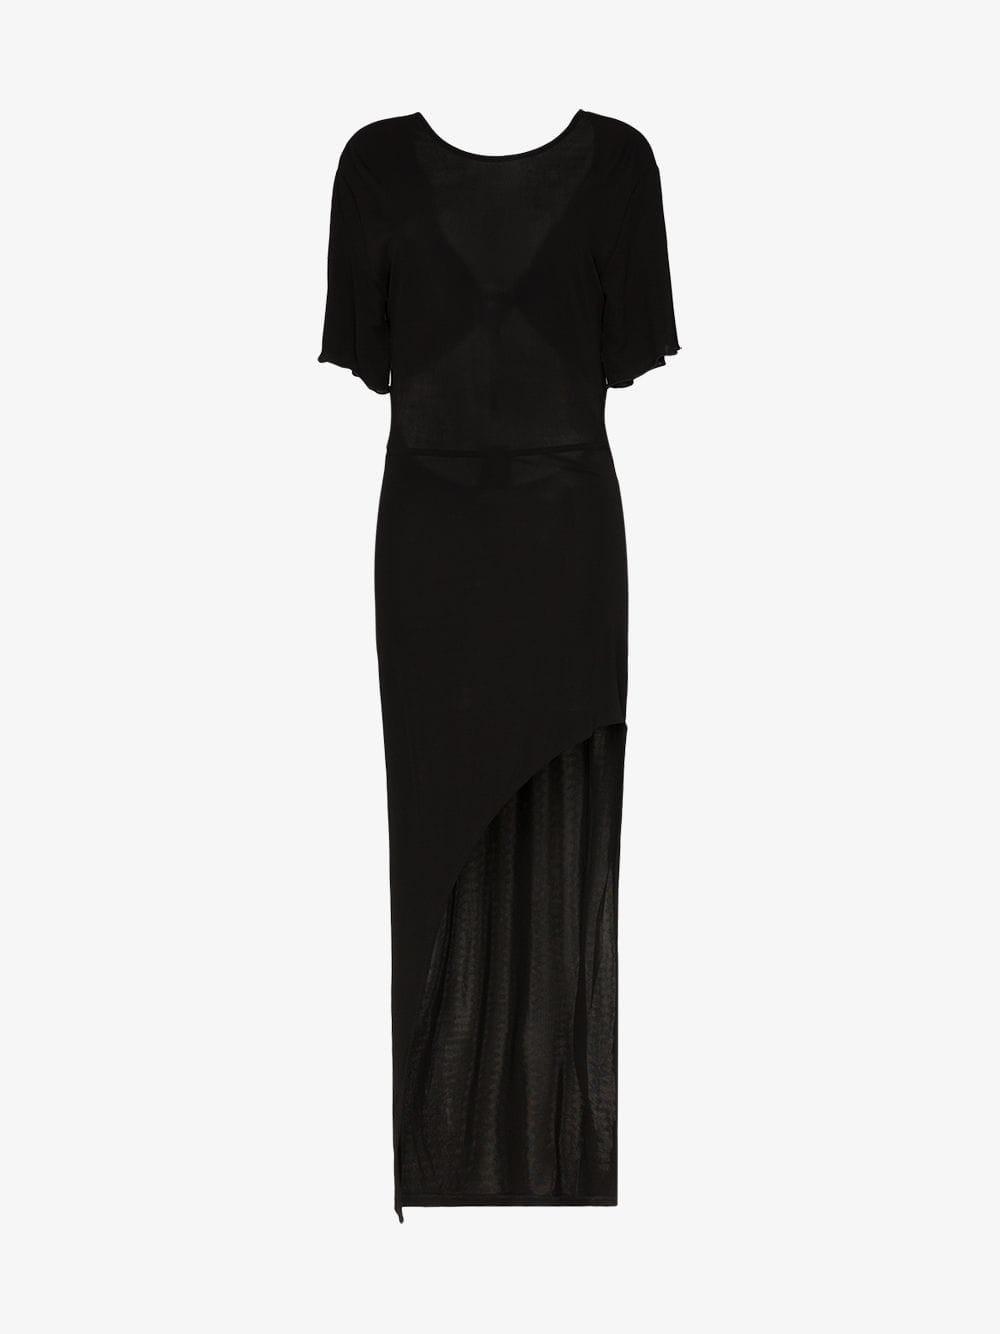 Faith Connexion Semi sheer asymmetric hem dress in black